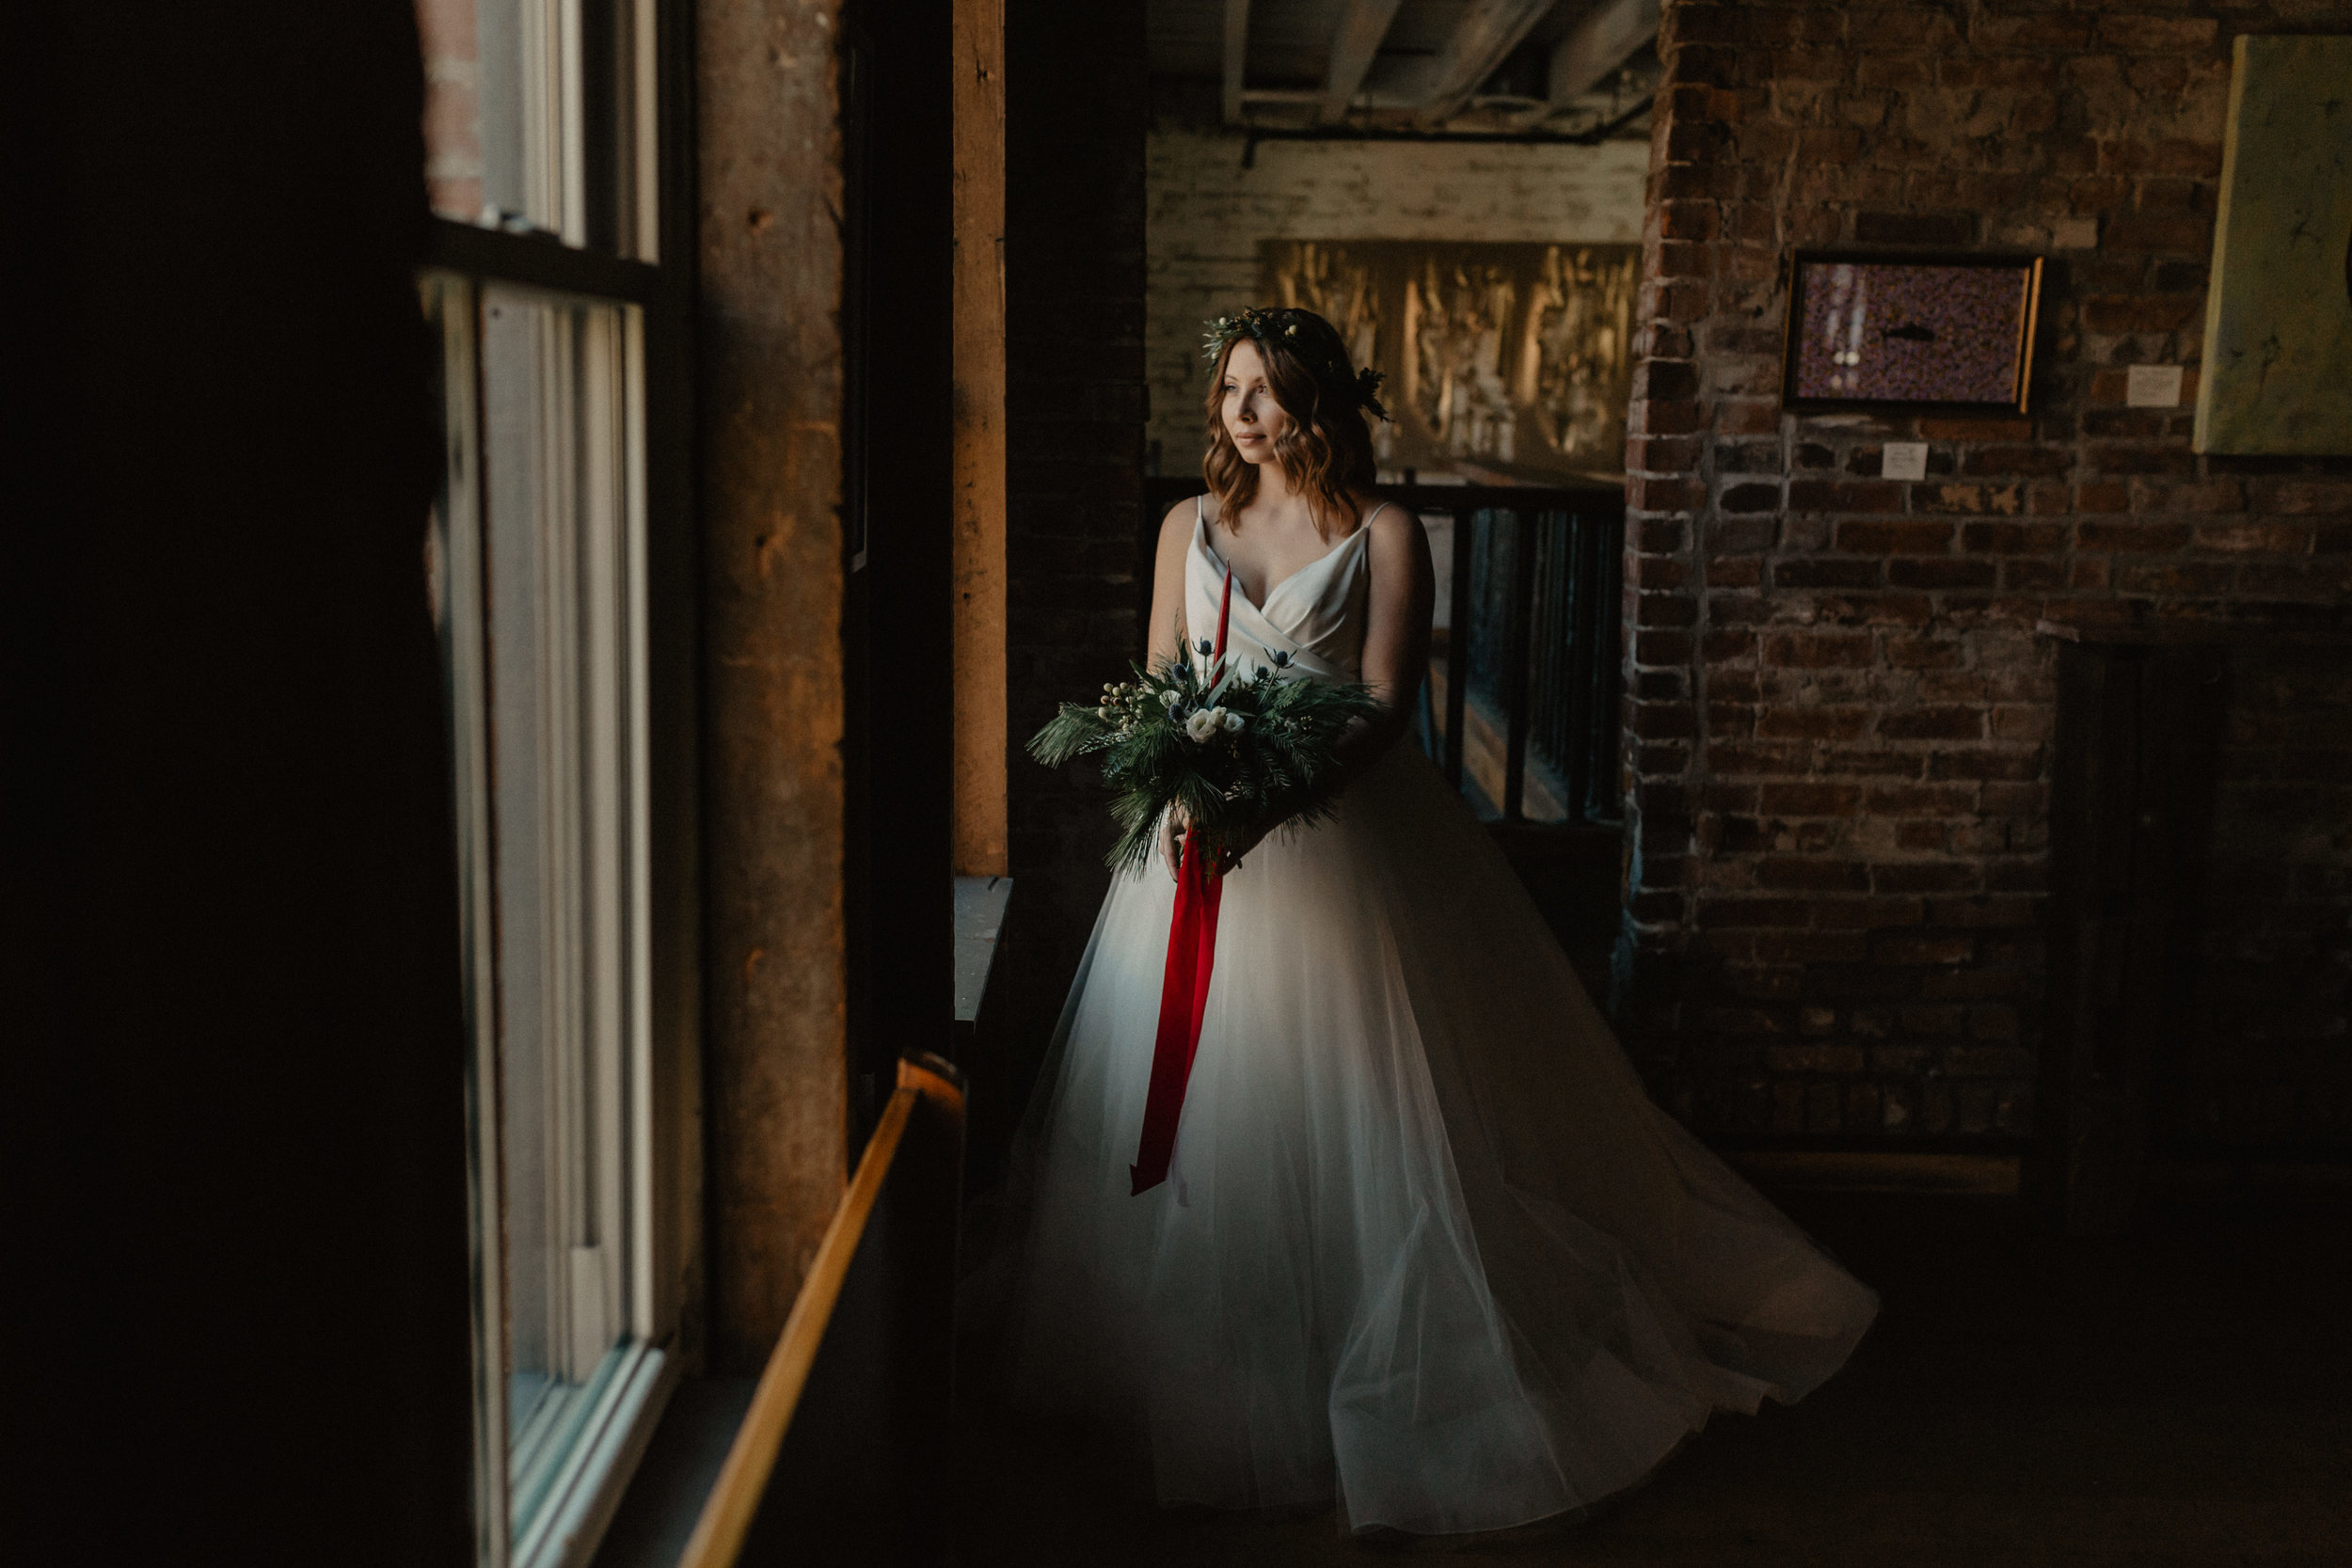 lucas_confectionery_wedding-2.jpg